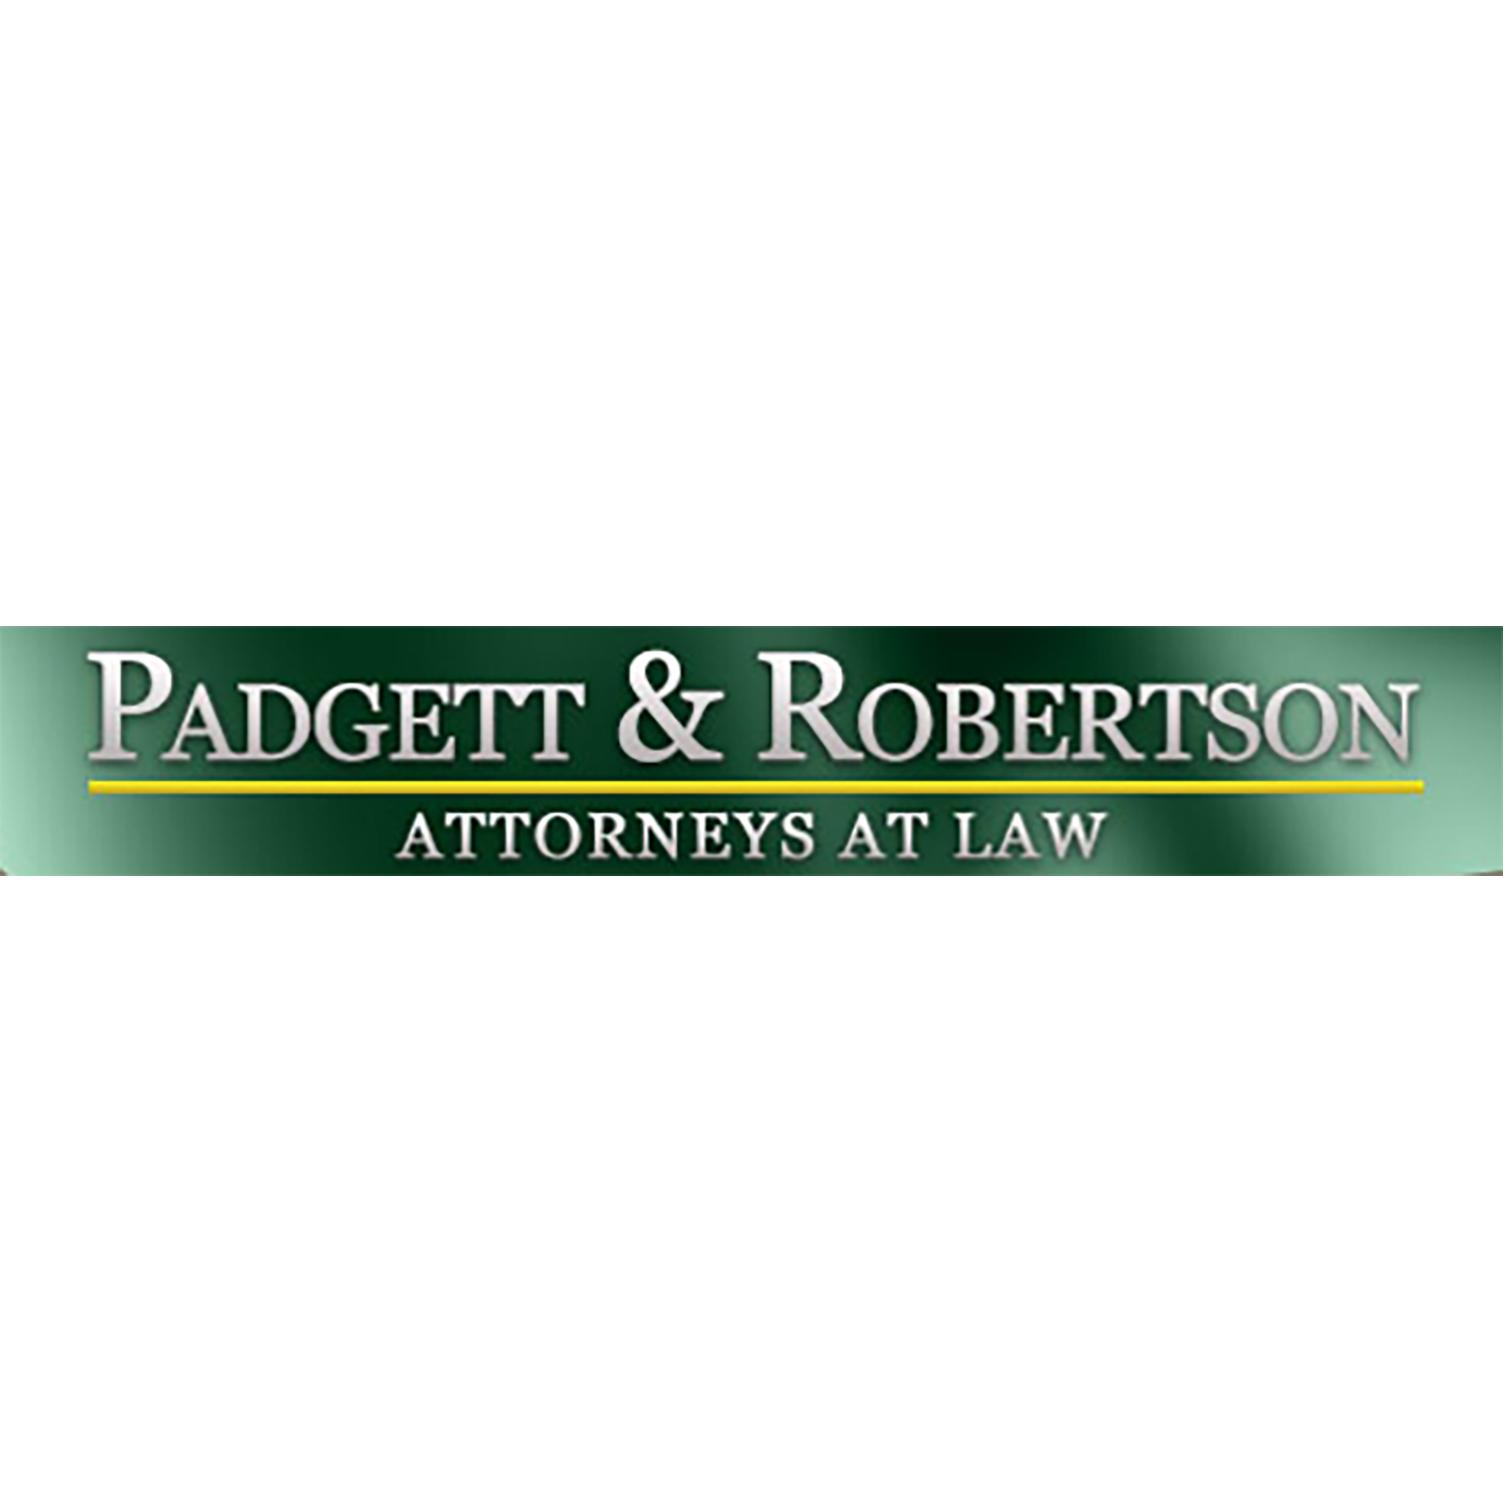 Padgett & Robertson